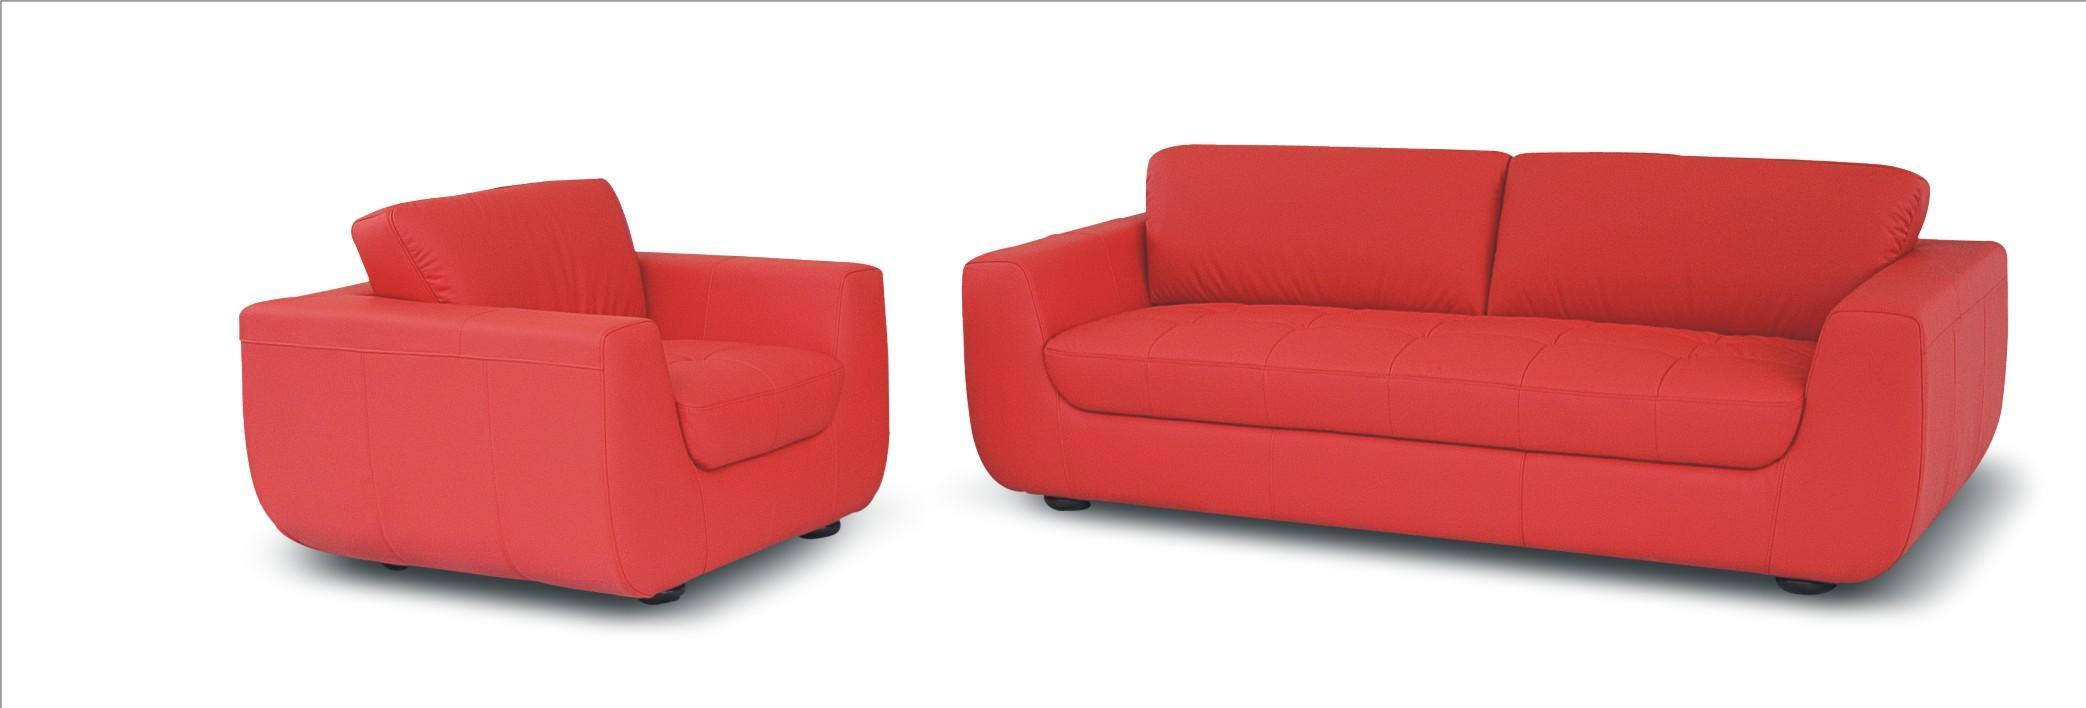 Sofa Set In Muar Wholesale, Sofa Suppliers - Alibaba